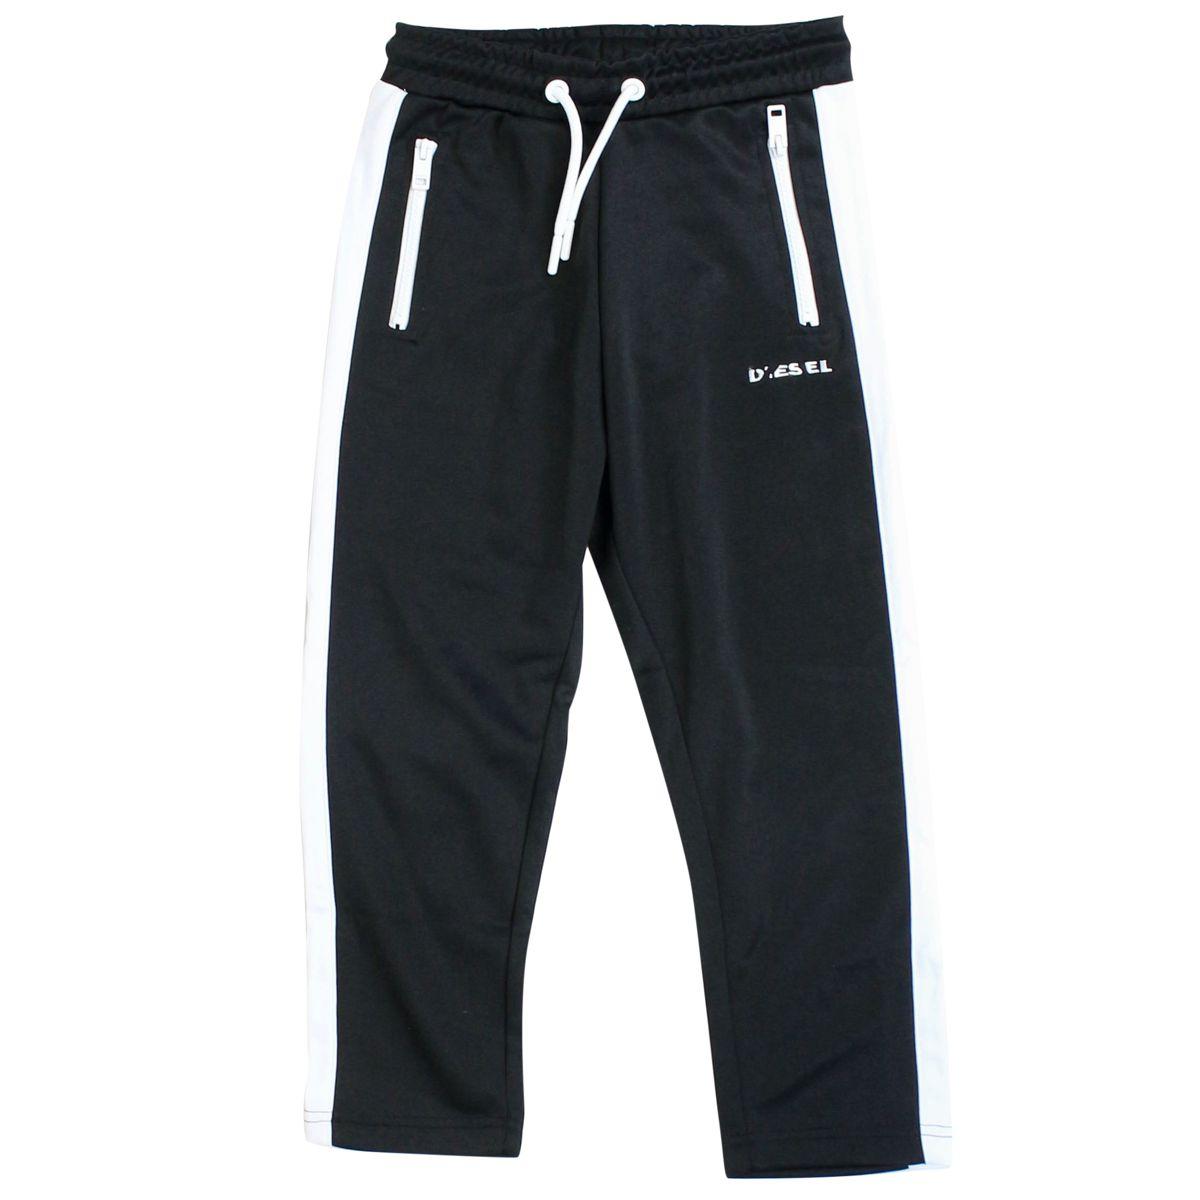 Cotton blend jojjing trousers with logo Black Diesel